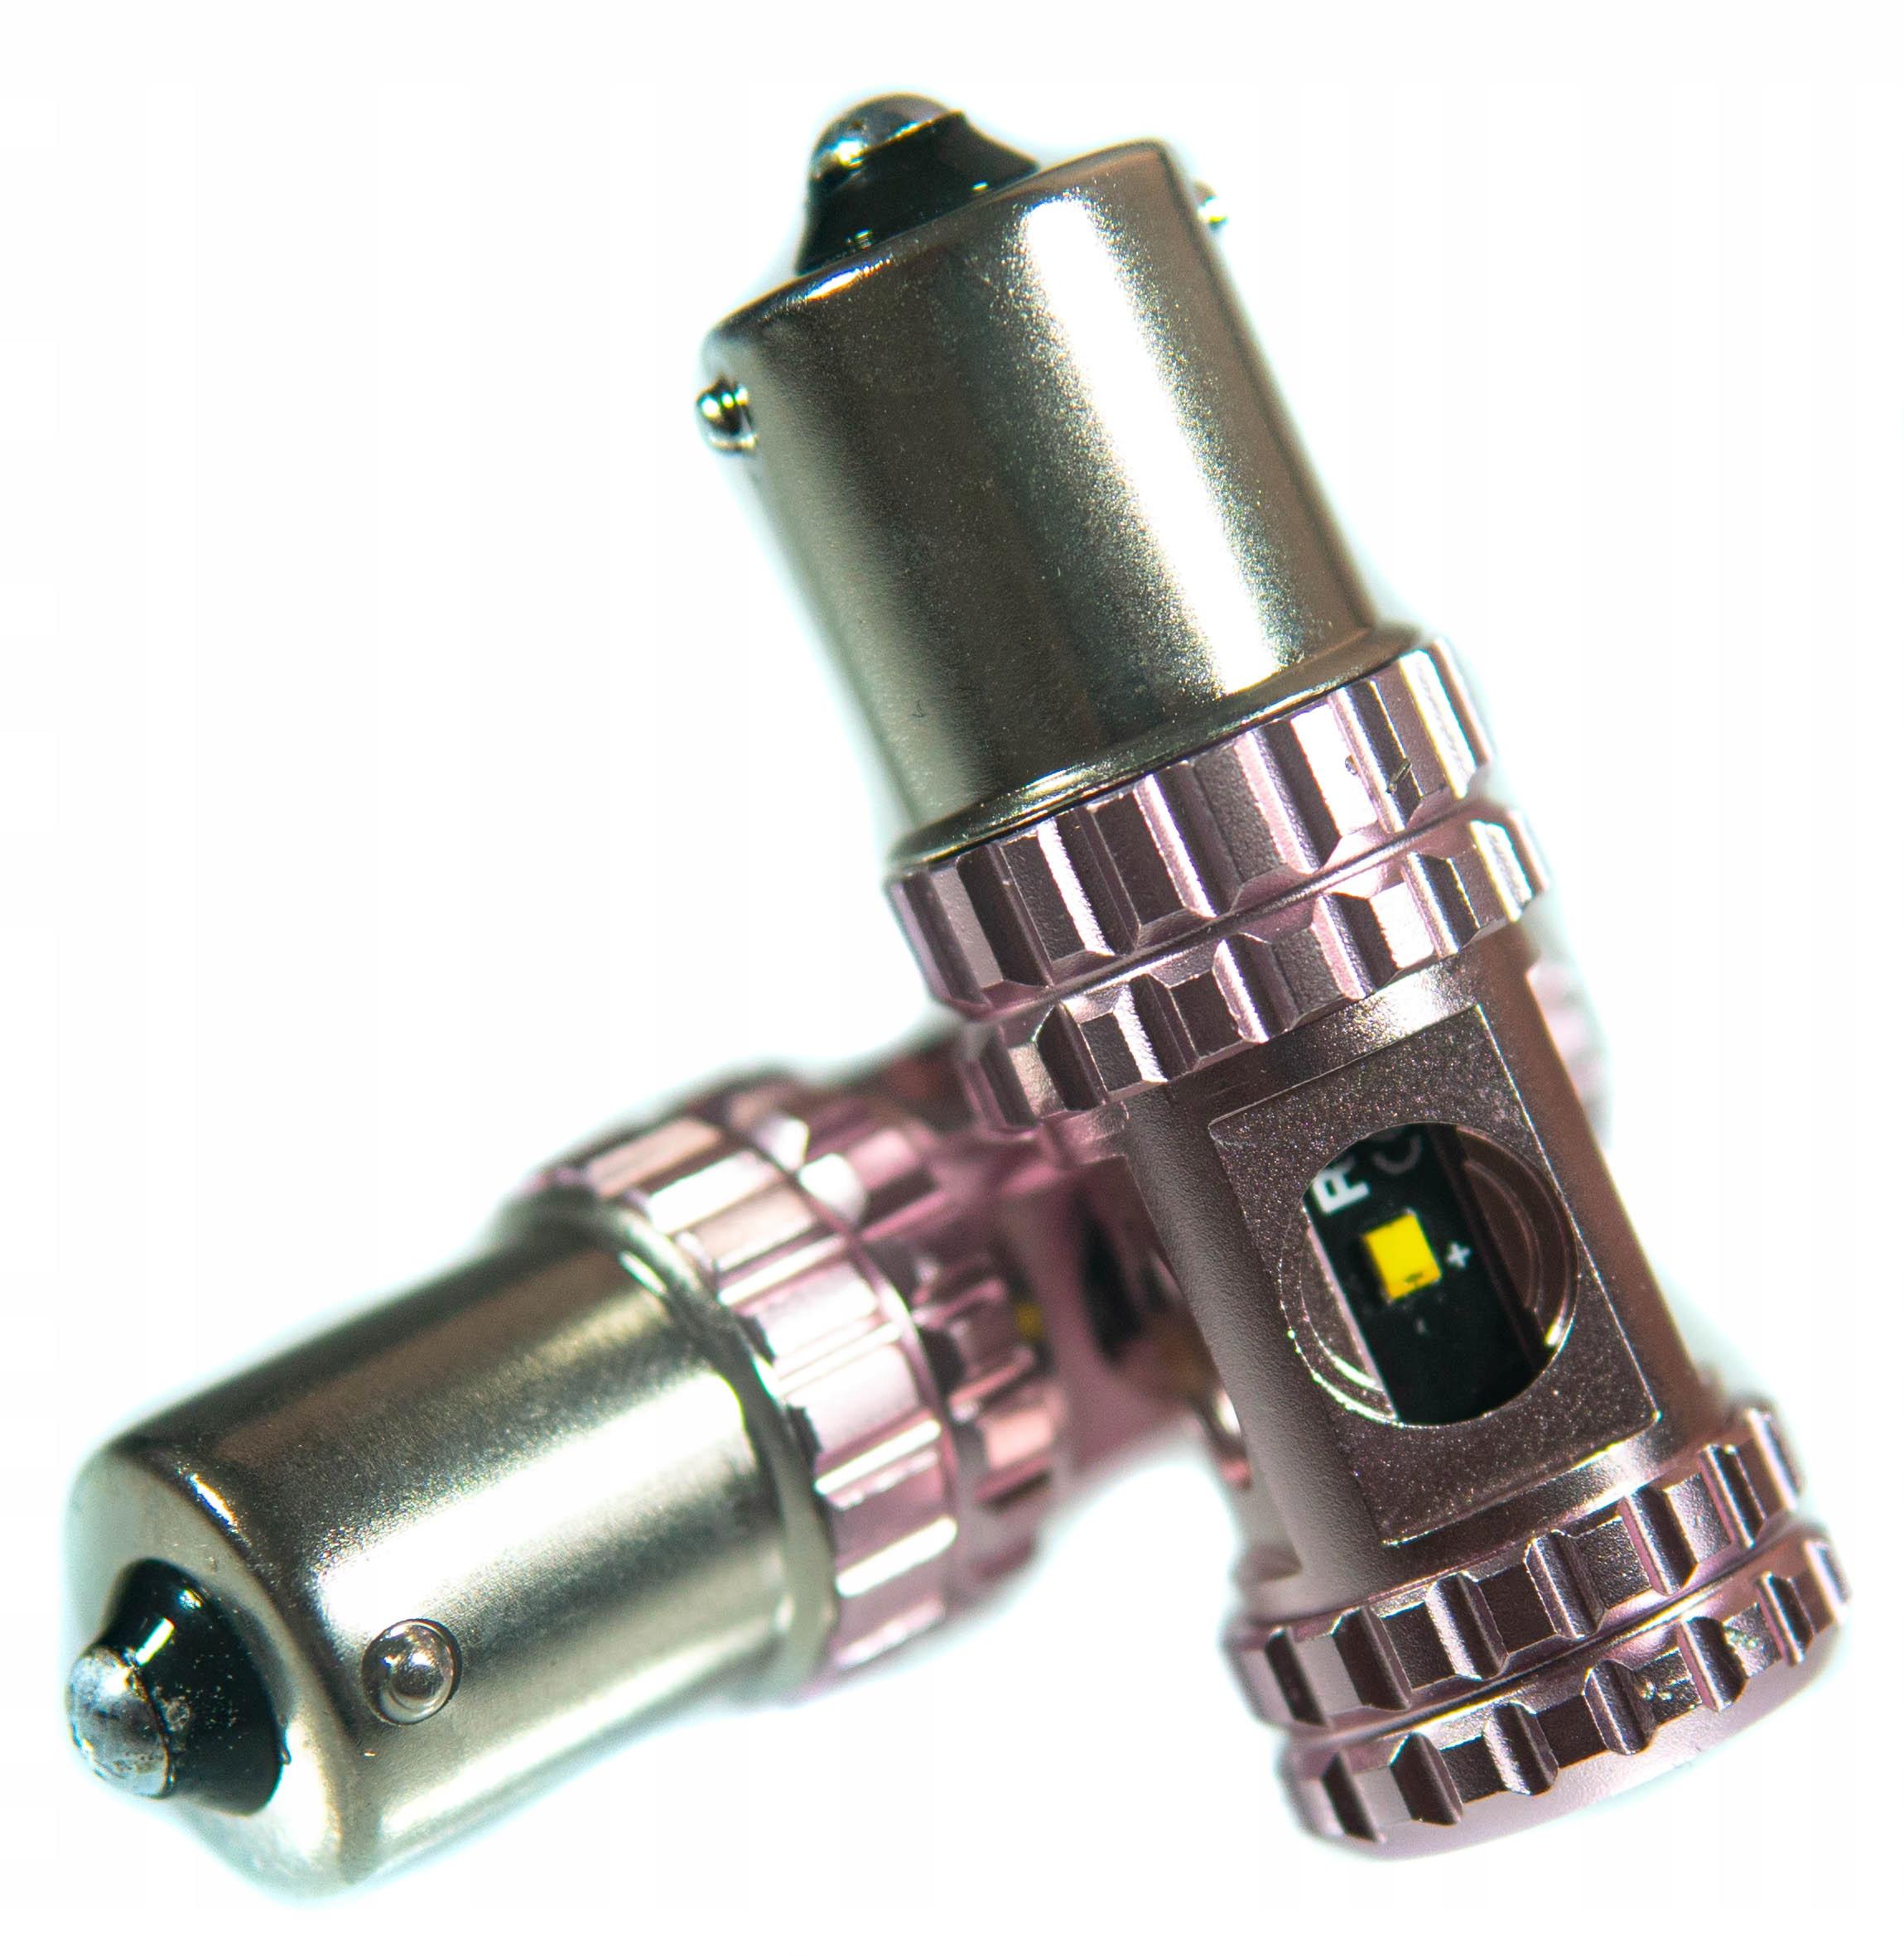 P21W 1156 LED - 6 SMD 3030 - BA15S - WSTECZNE LEDY